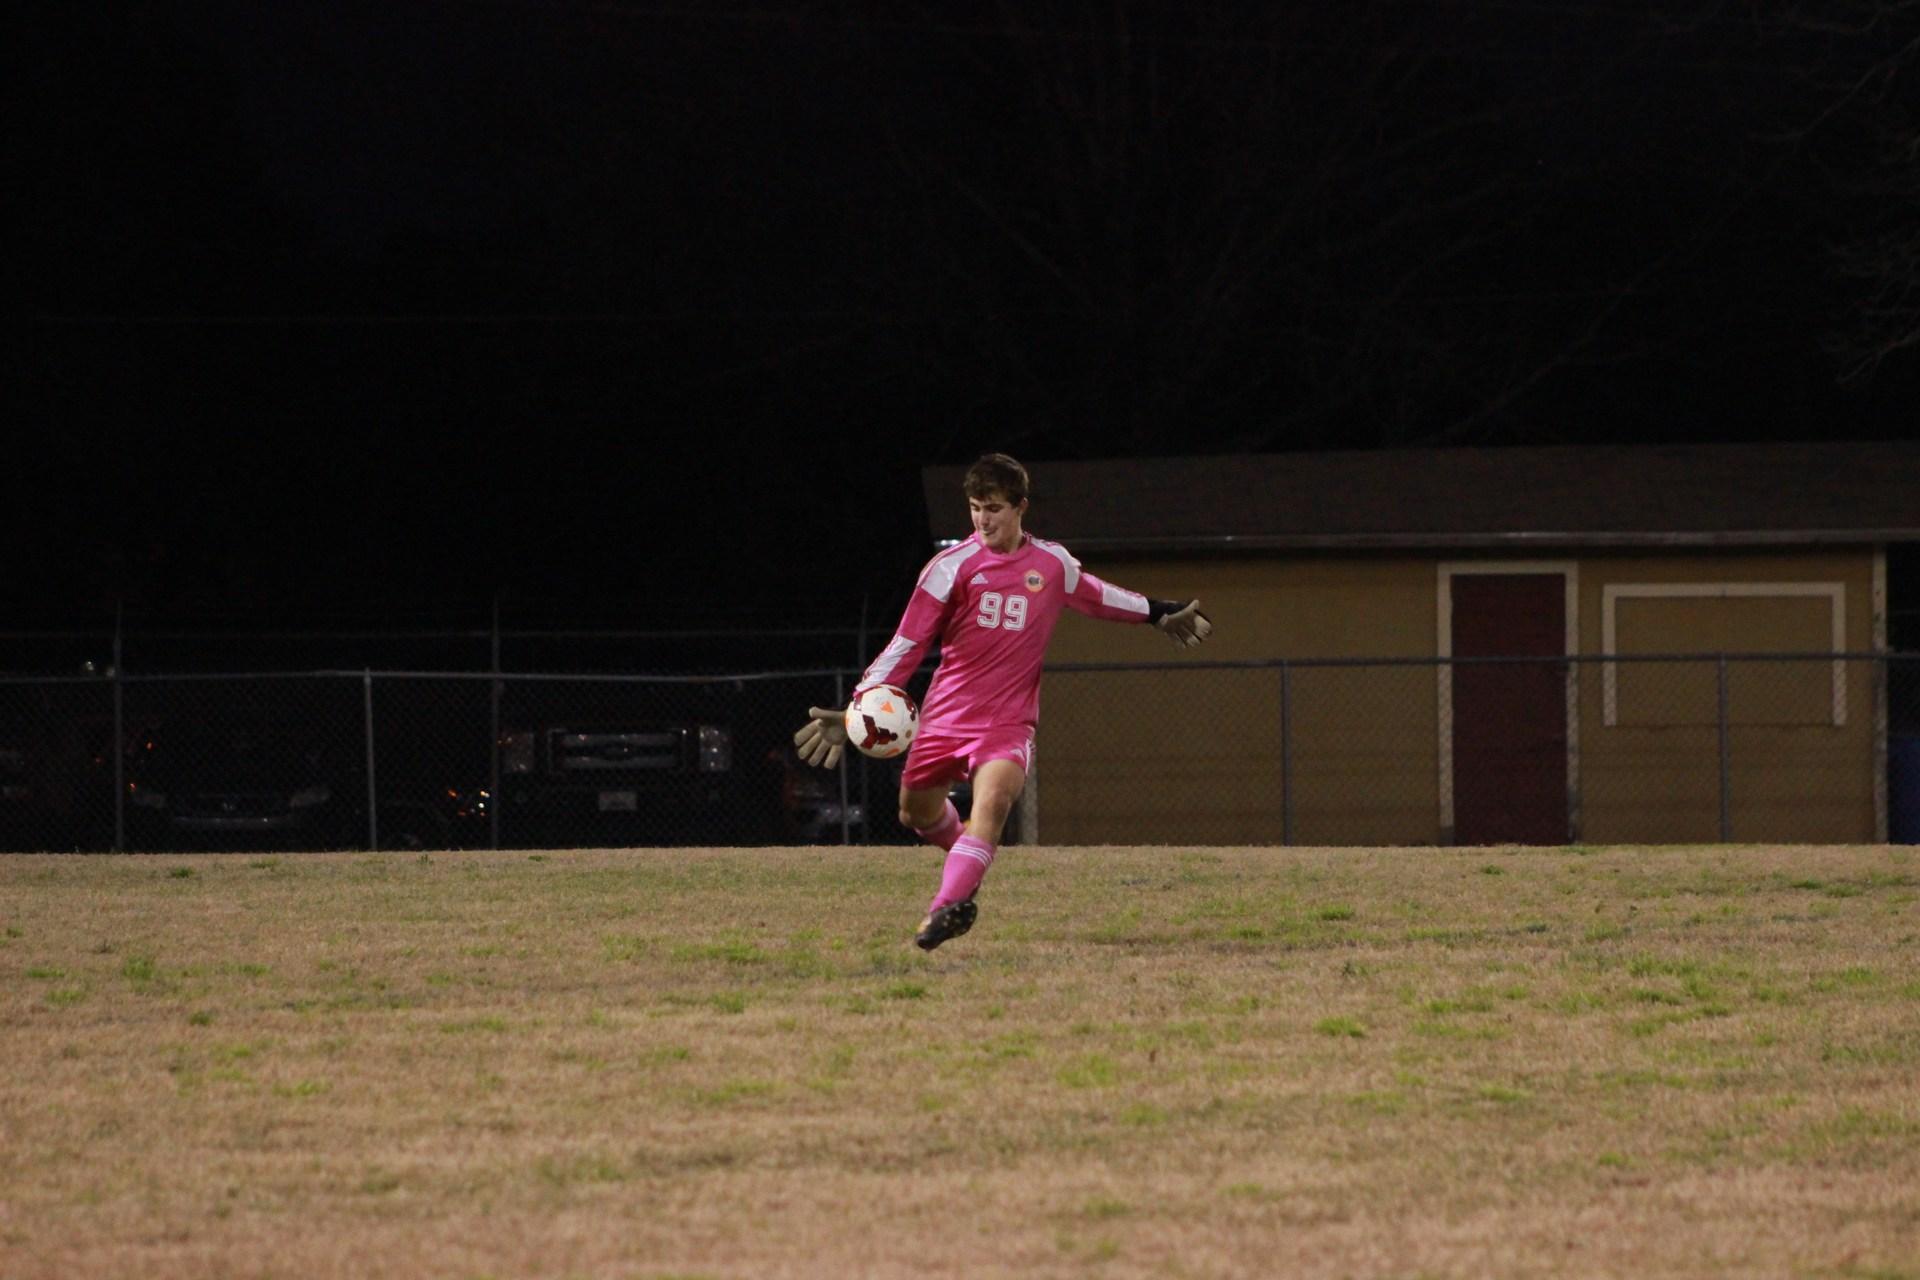 Grant S. kicks the play to his team members.